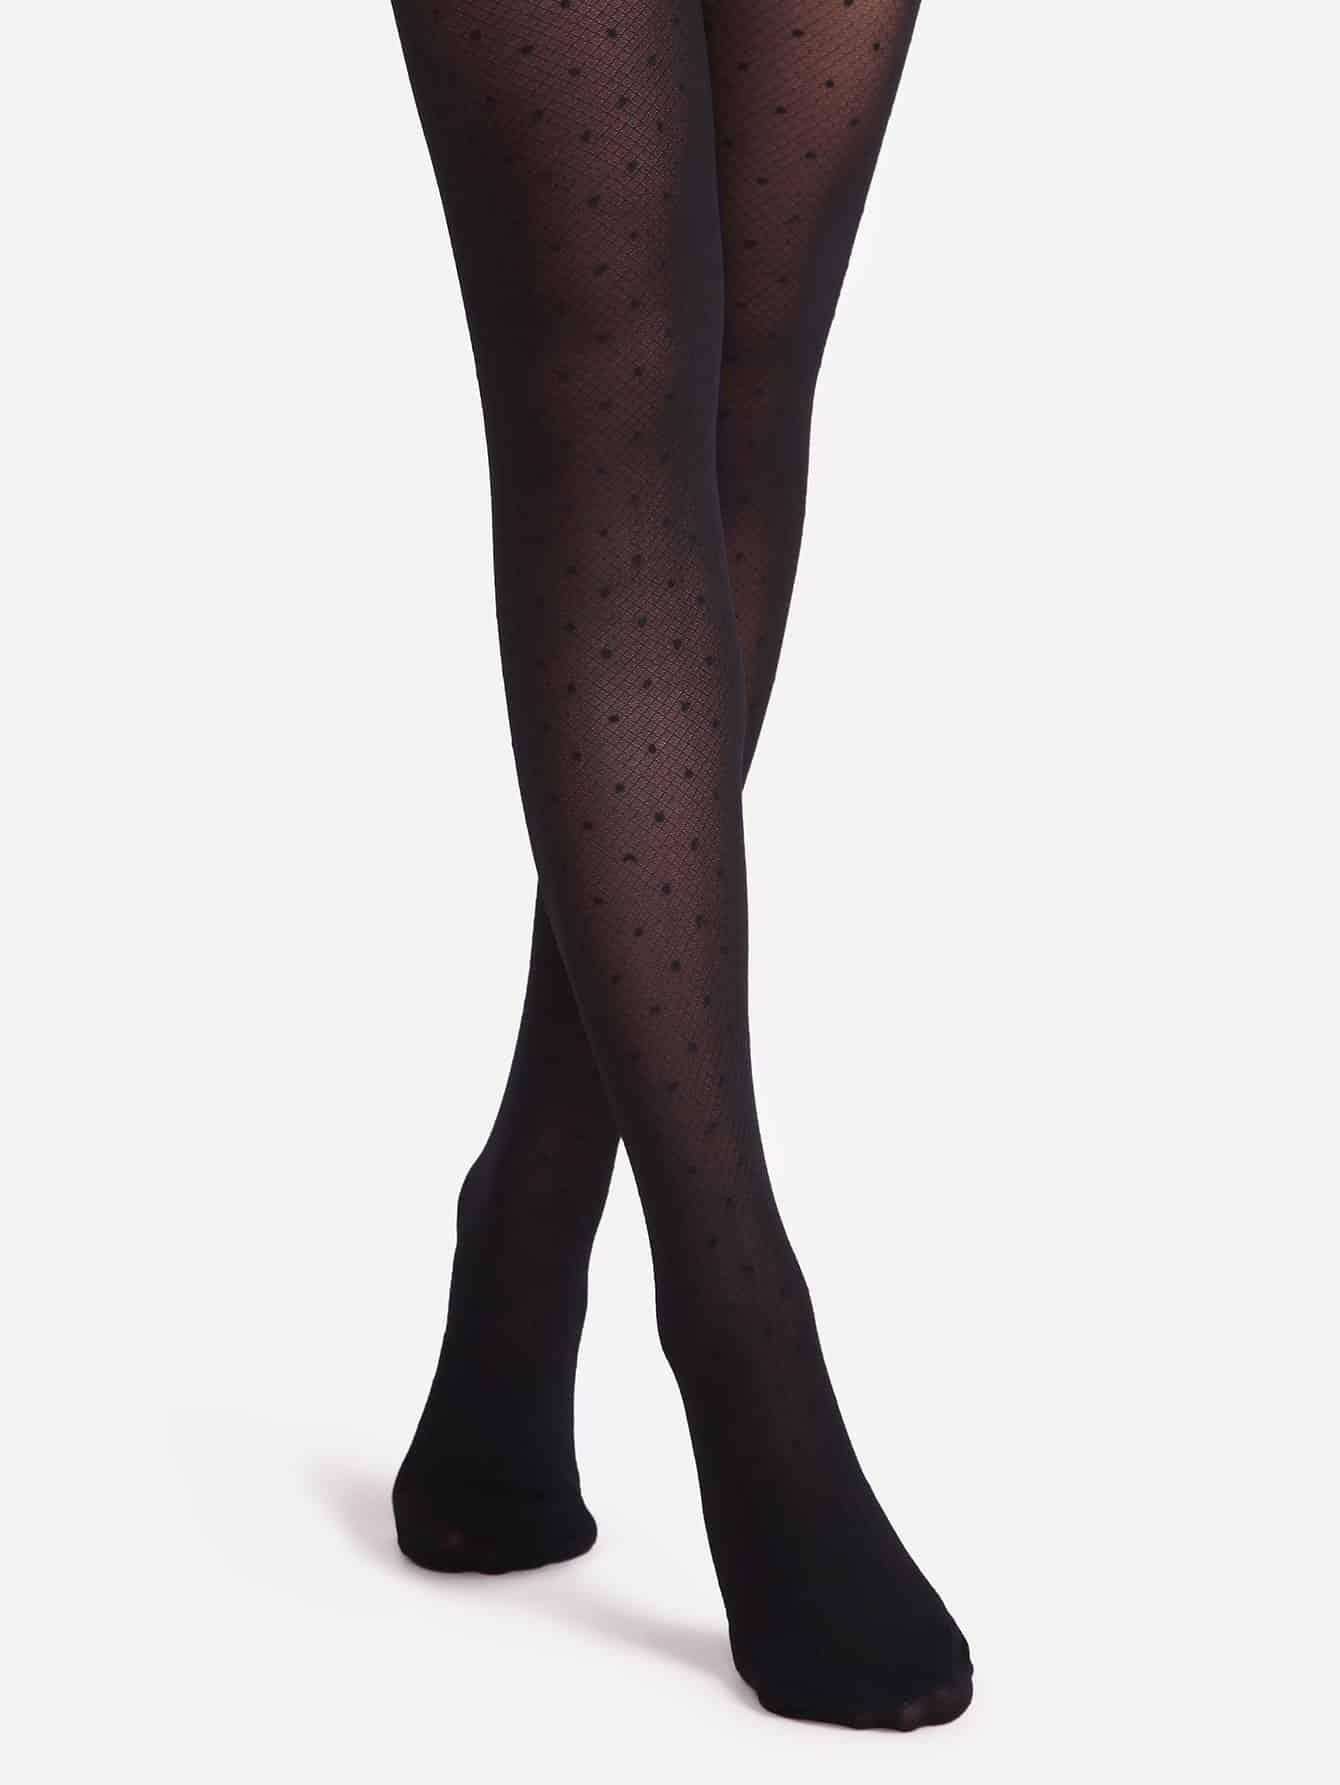 Black Polka Dot Sheer Pantyhose Stockings женские колготки pantyhose 2015 sexy sheer sheer stockings